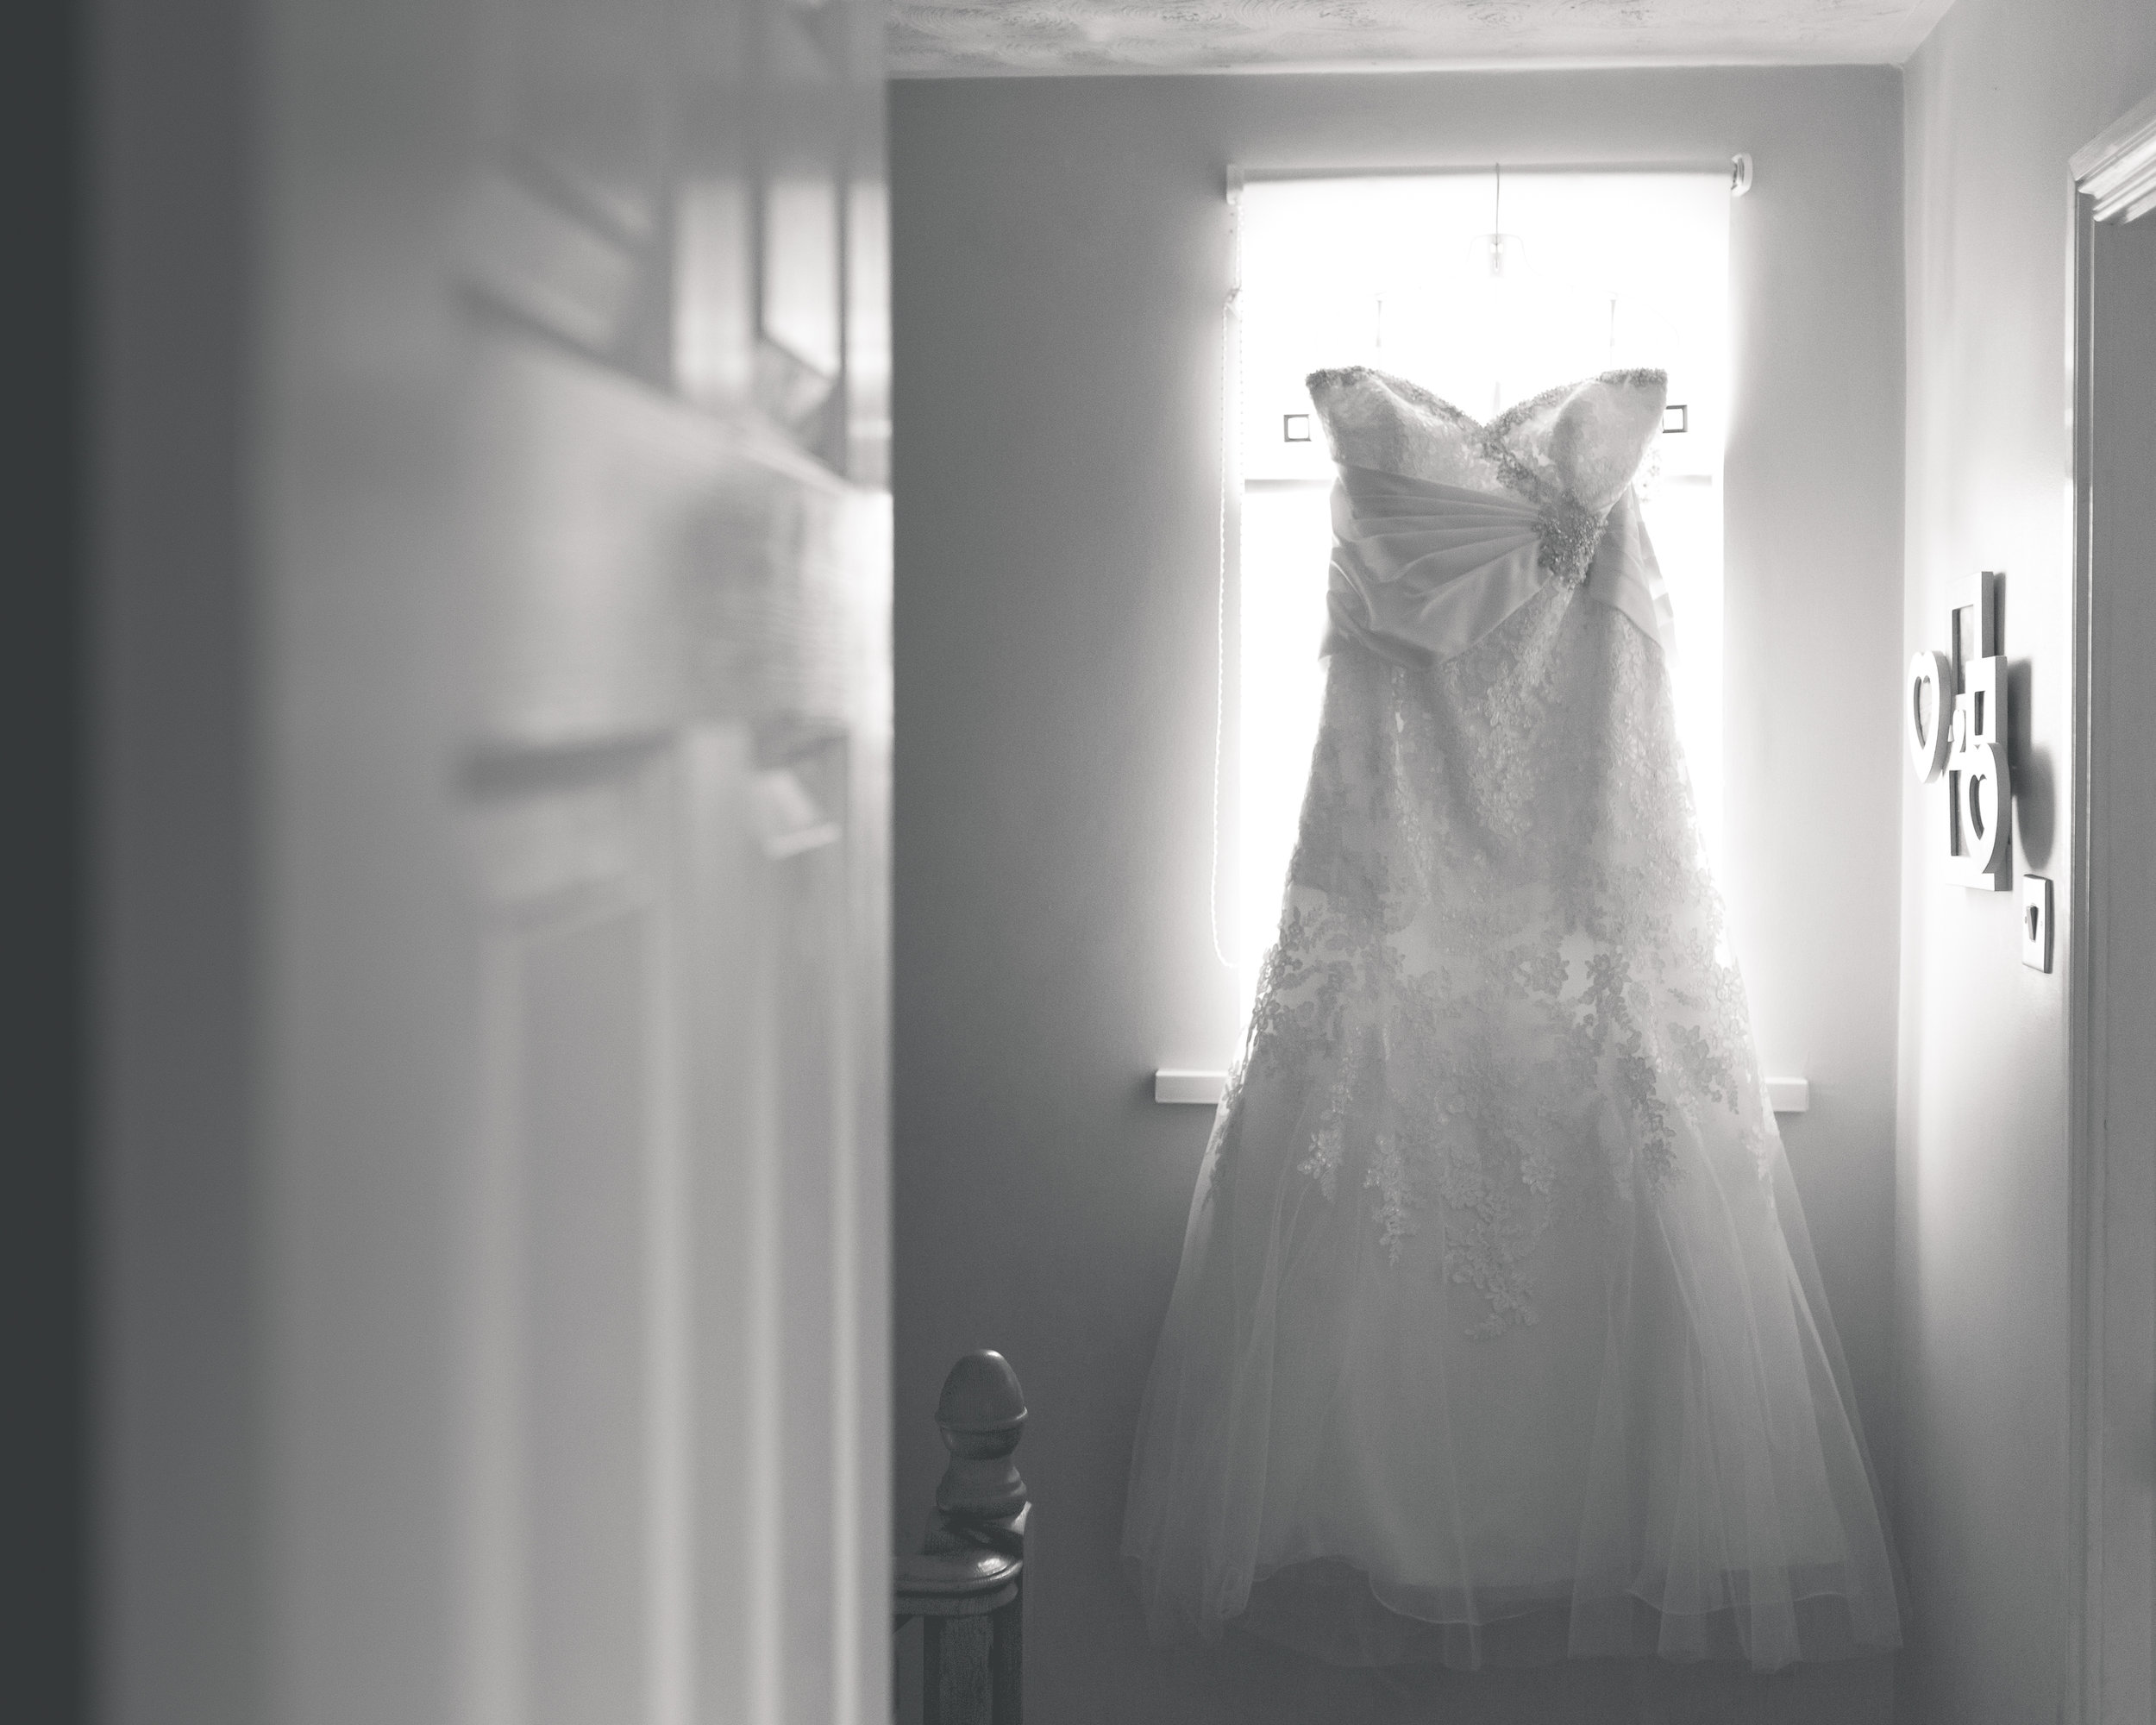 Antoinette & Stephen - Bridal Preparations | Brian McEwan Photography | Wedding Photographer Northern Ireland 5.jpg